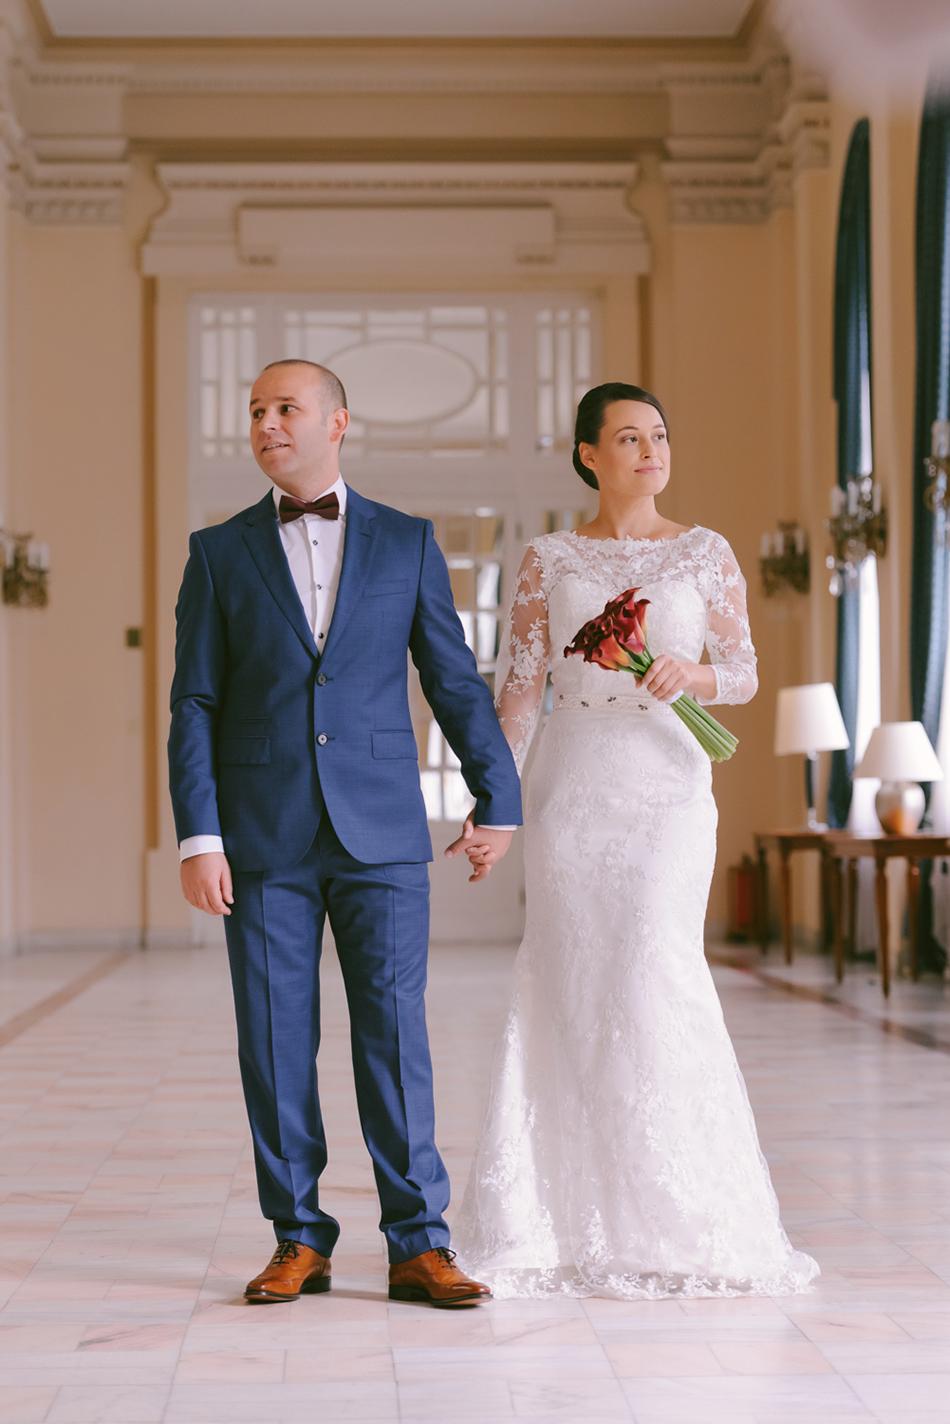 AD Passion Photography | fotograf-nunta-sinaia-flo-oana_0123 | Adelin, Dida, fotograf profesionist, fotograf de nunta, fotografie de nunta, fotograf Timisoara, fotograf Craiova, fotograf Bucuresti, fotograf Arad, nunta Timisoara, nunta Arad, nunta Bucuresti, nunta Craiova